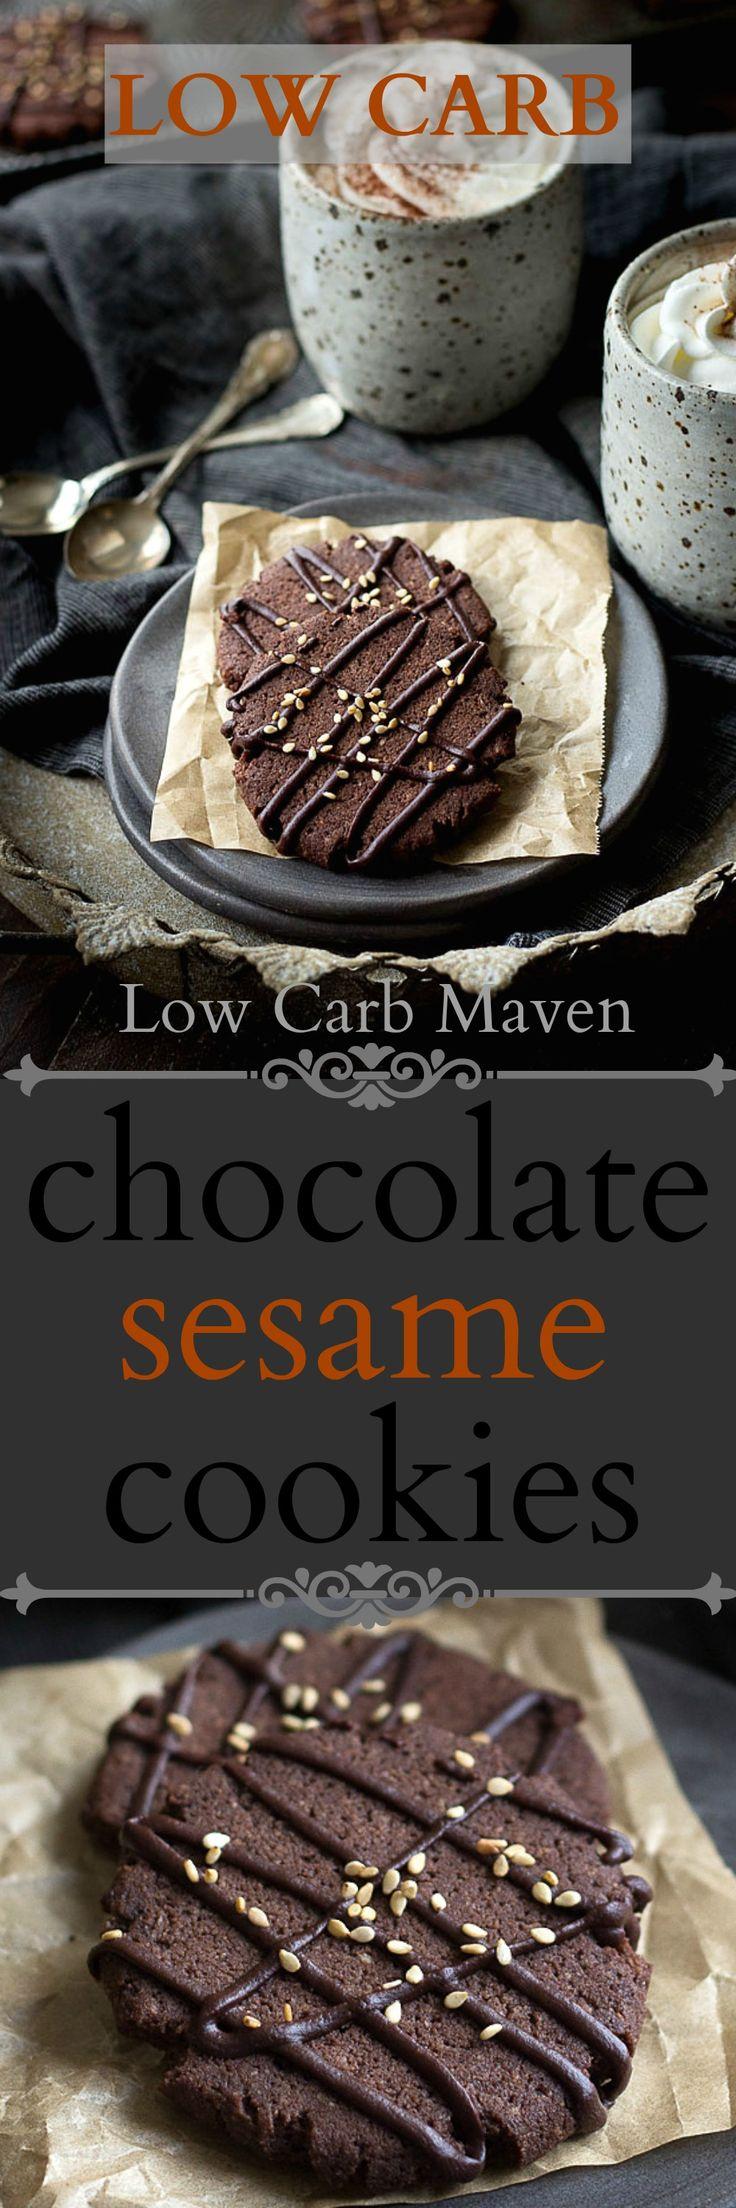 Low carb chocolate sesame cookies have a crispy texture & taste like brownies!